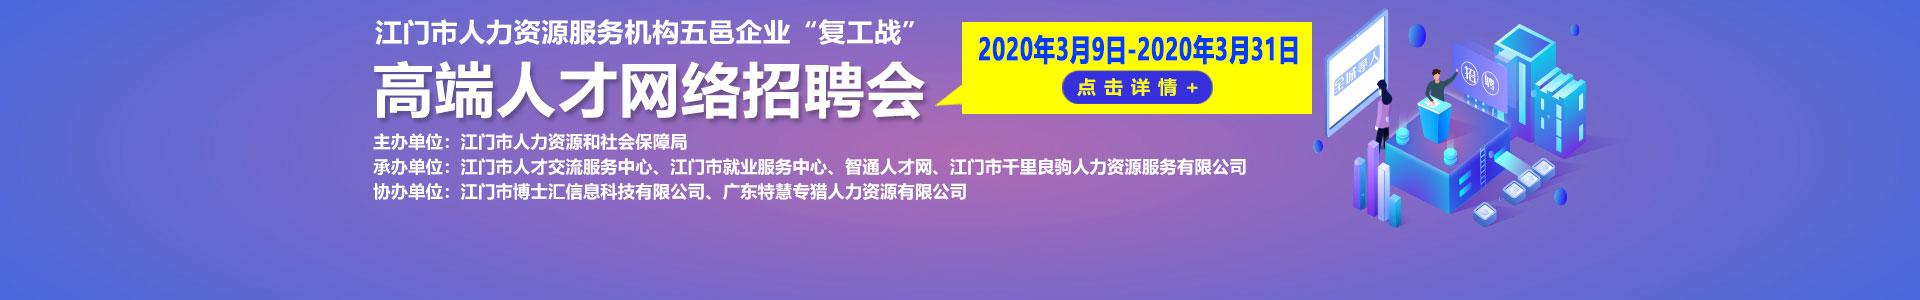 0309高(gao)端(duan)